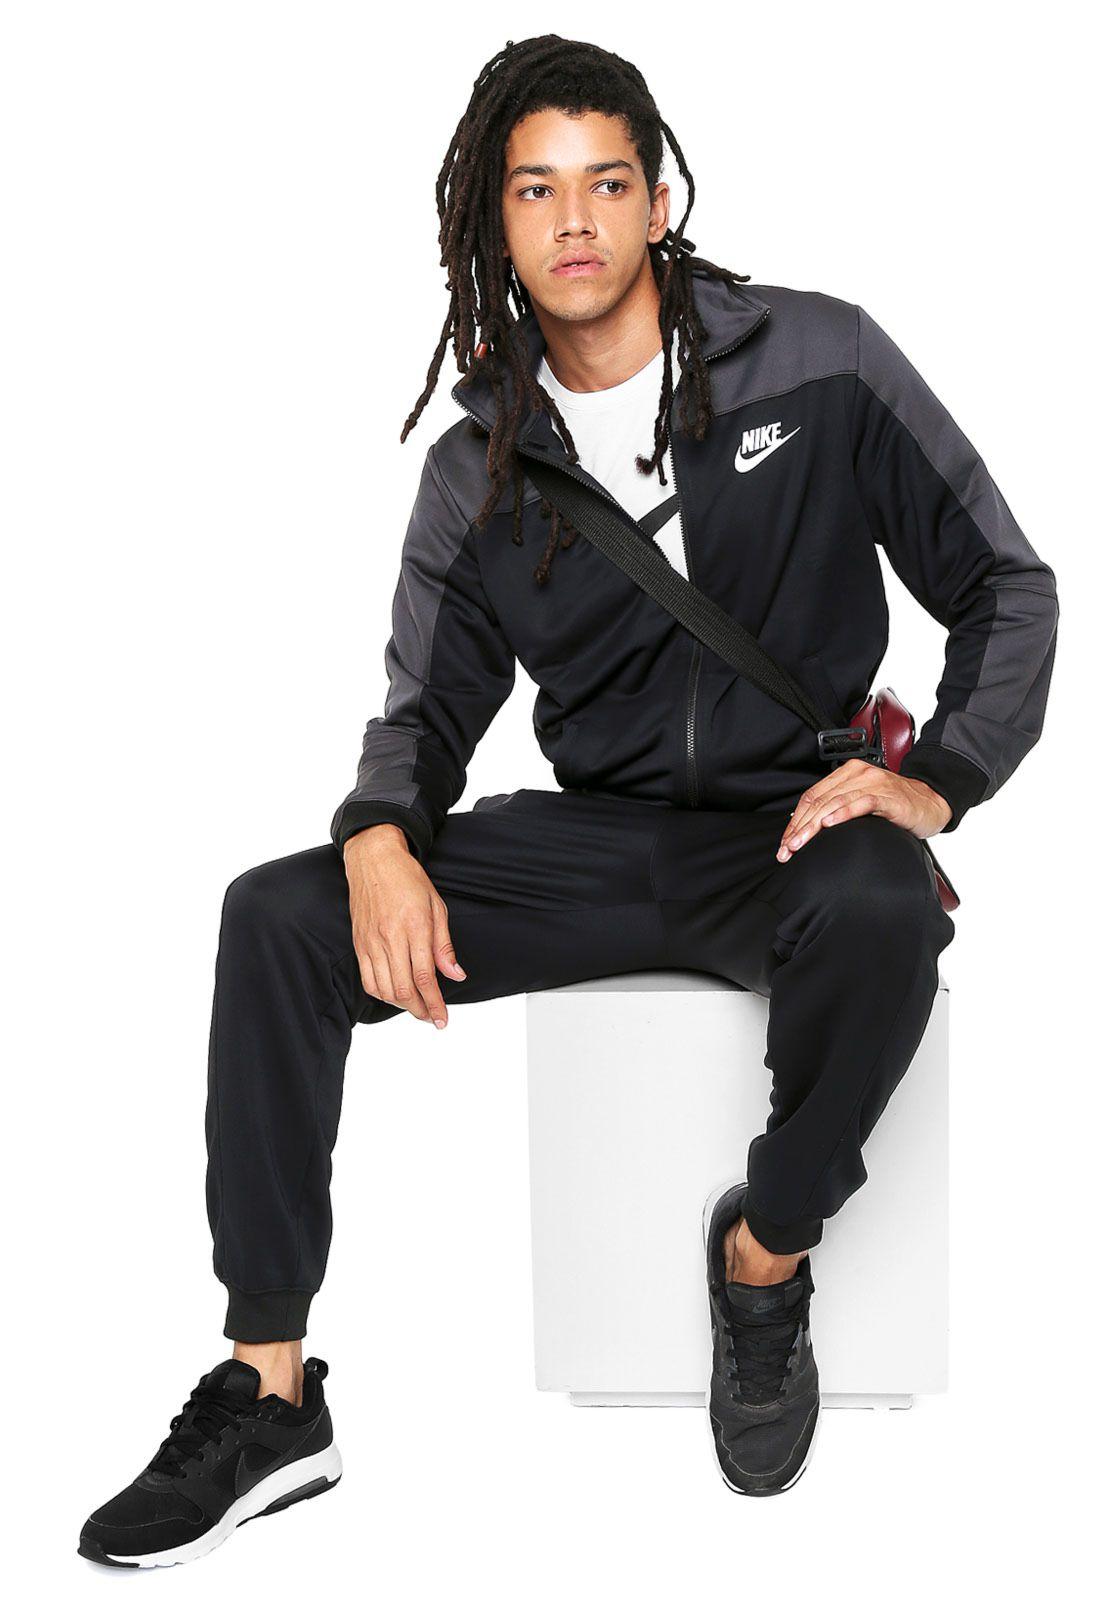 b8e30c14c3f Conjunto Agasalho Masculino Nike Trk Suit Pk- Preto - BRACIA SHOP ...